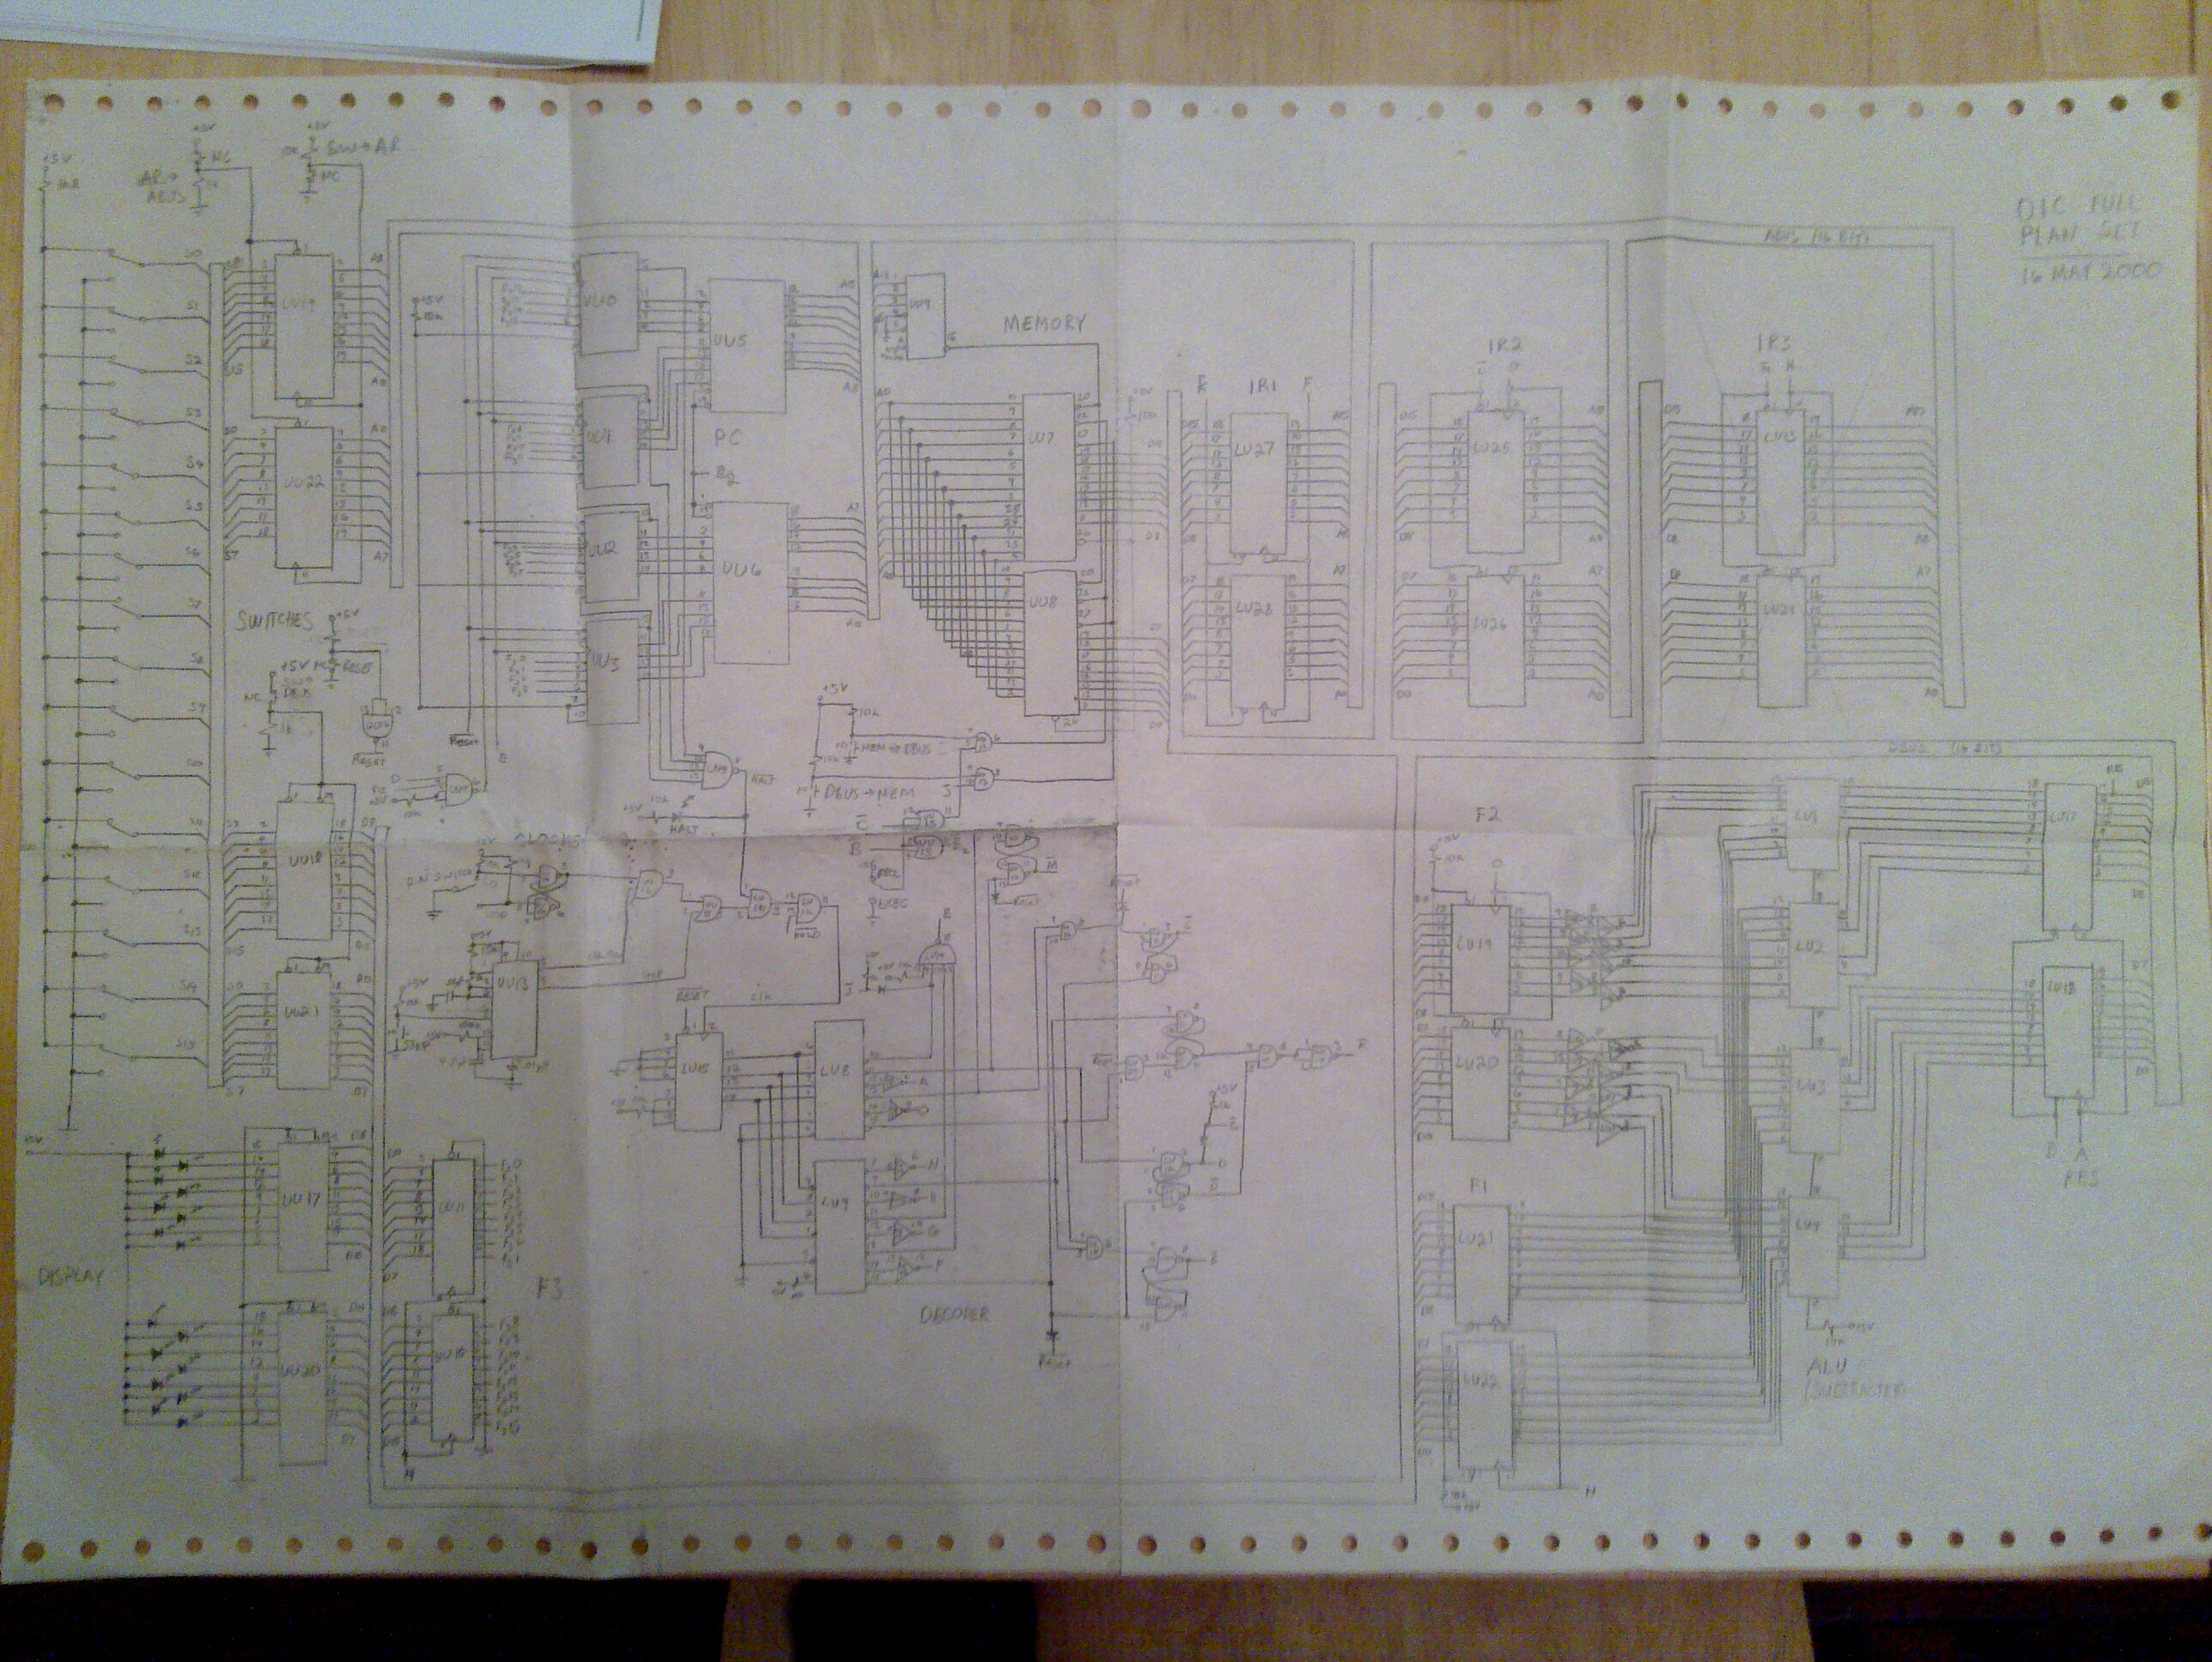 New Circuits Page 162 Door Buzzer Sound With Cd4001 Cd4060 Hobbies